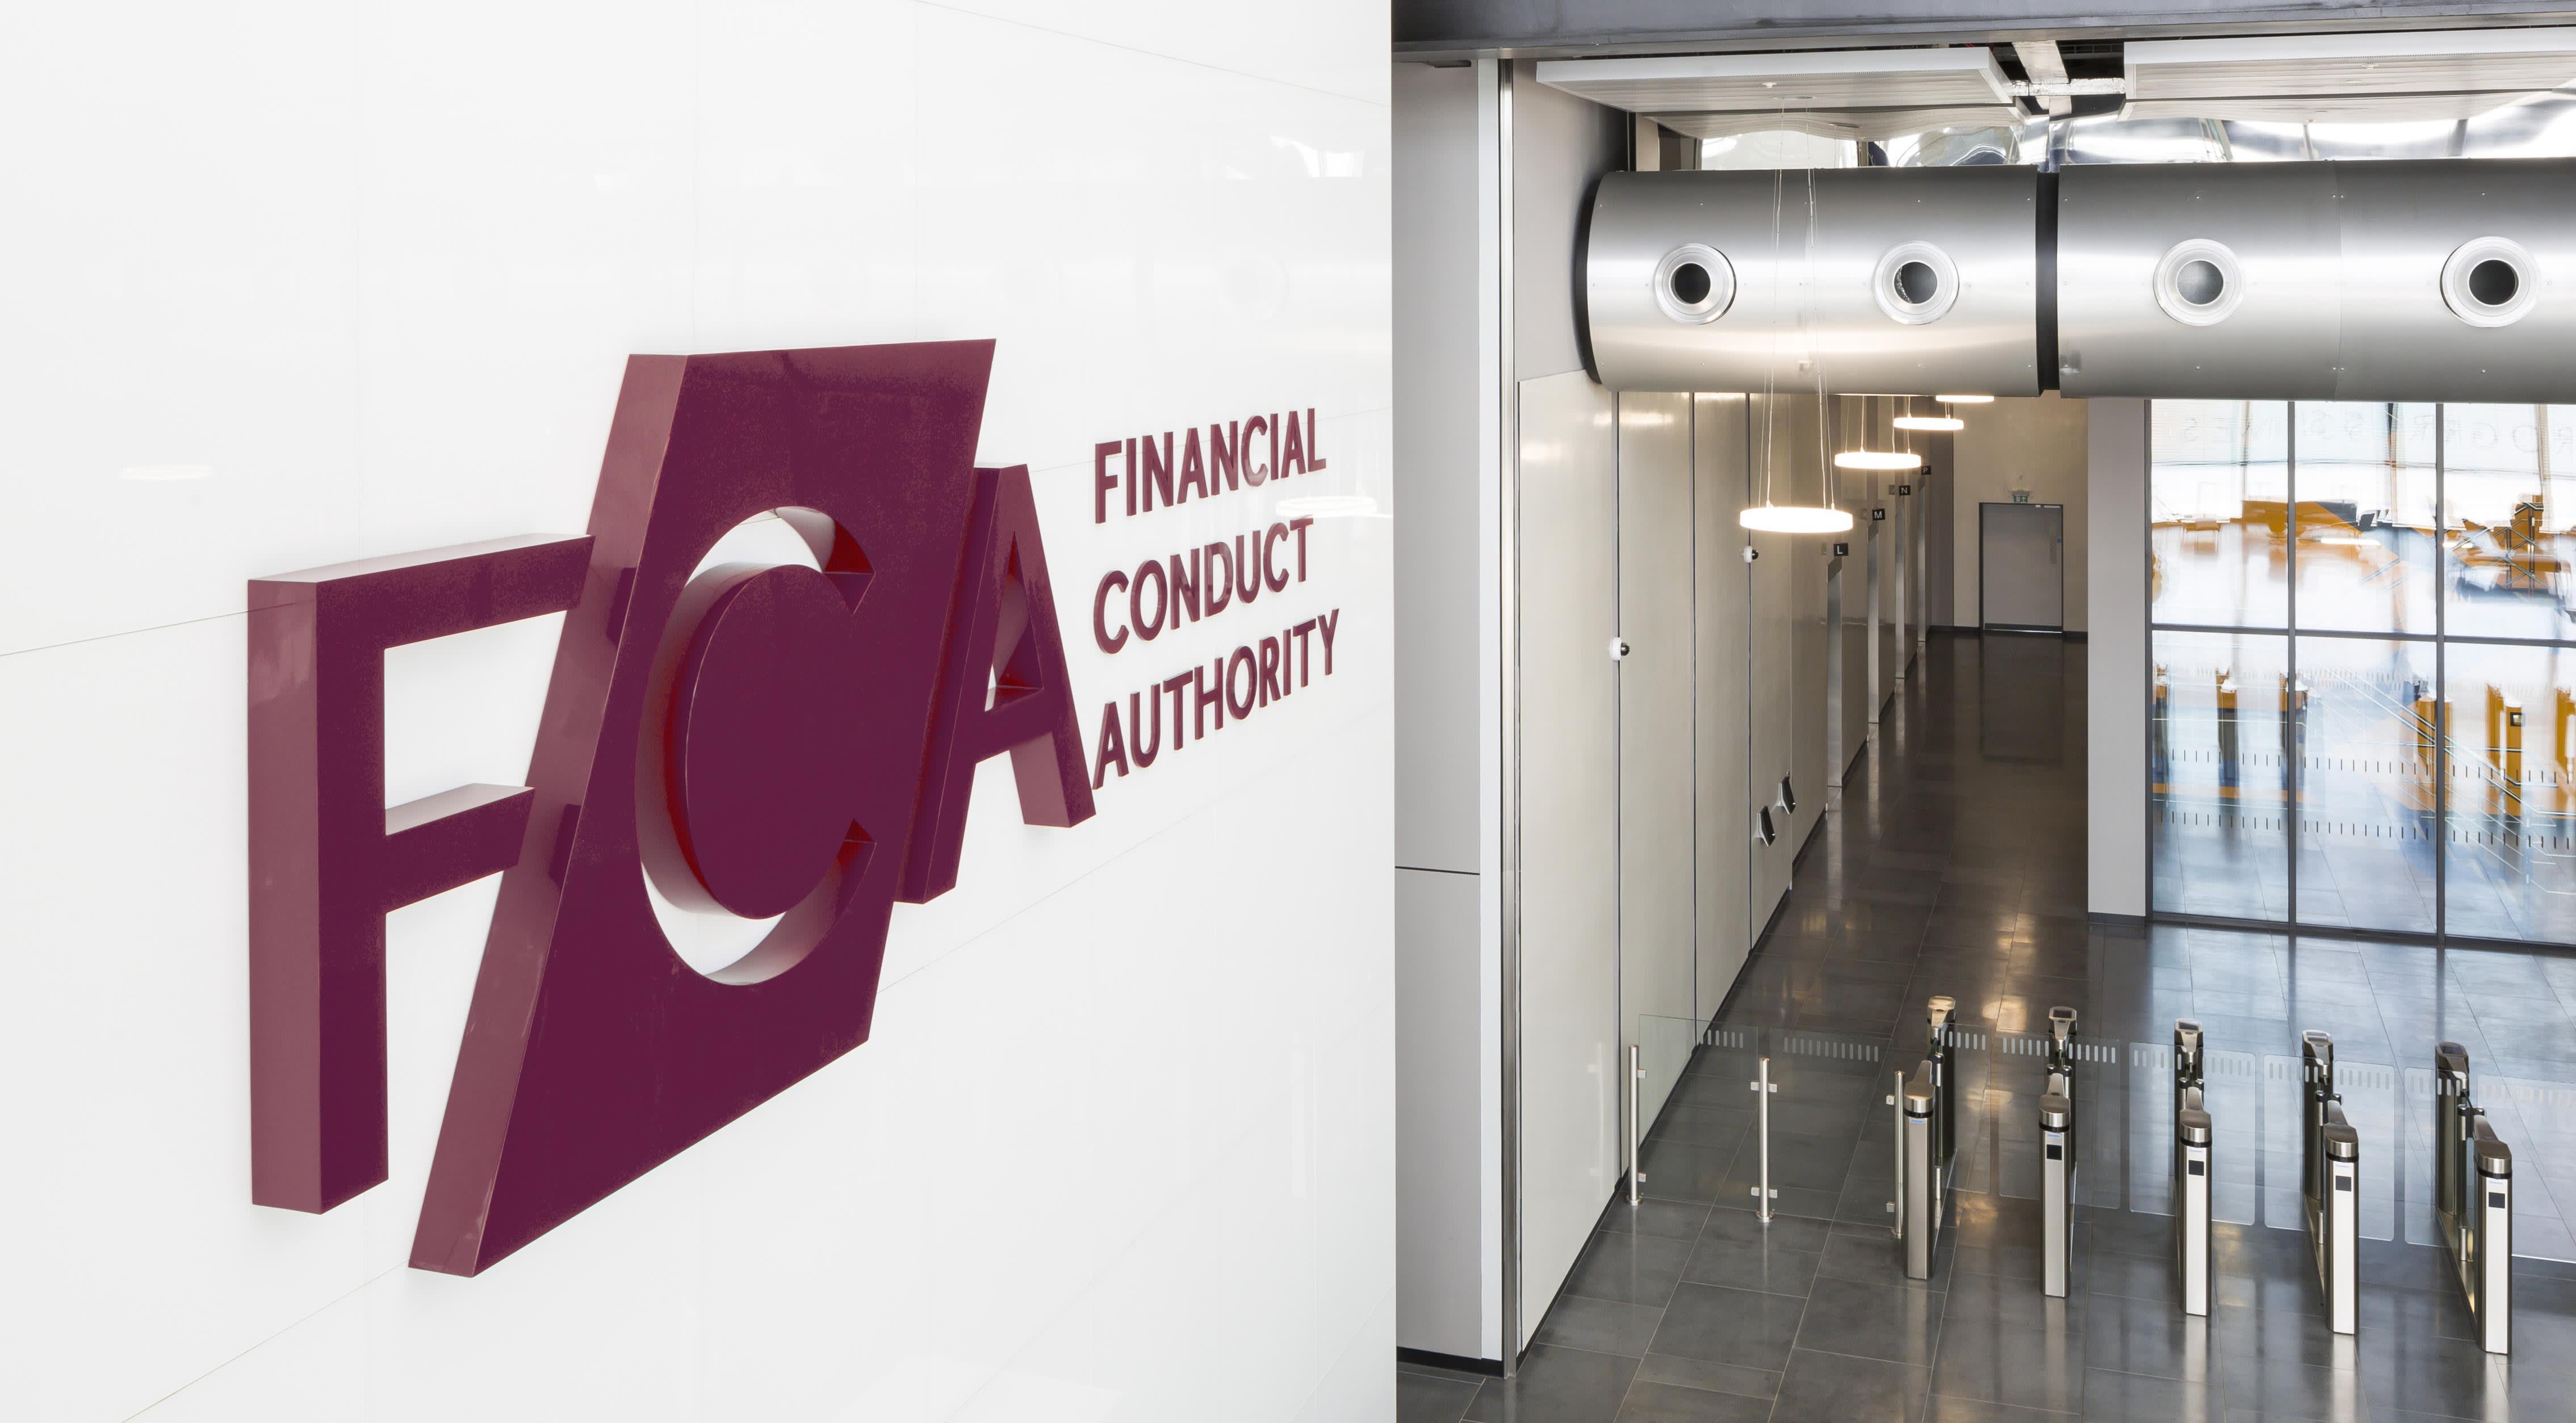 FCA criticised for falsely black-marking adviser